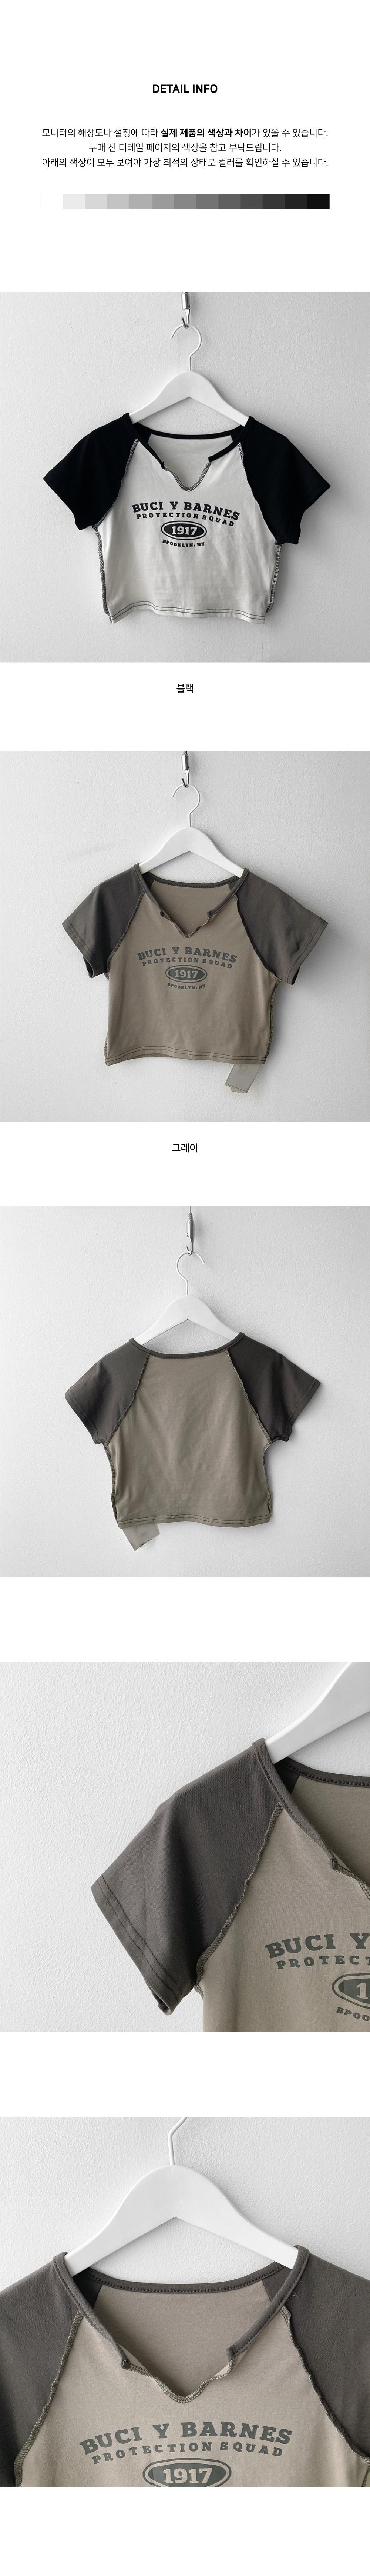 Wind Stitch Overlock Print Split Crop Short Sleeve T-shirt